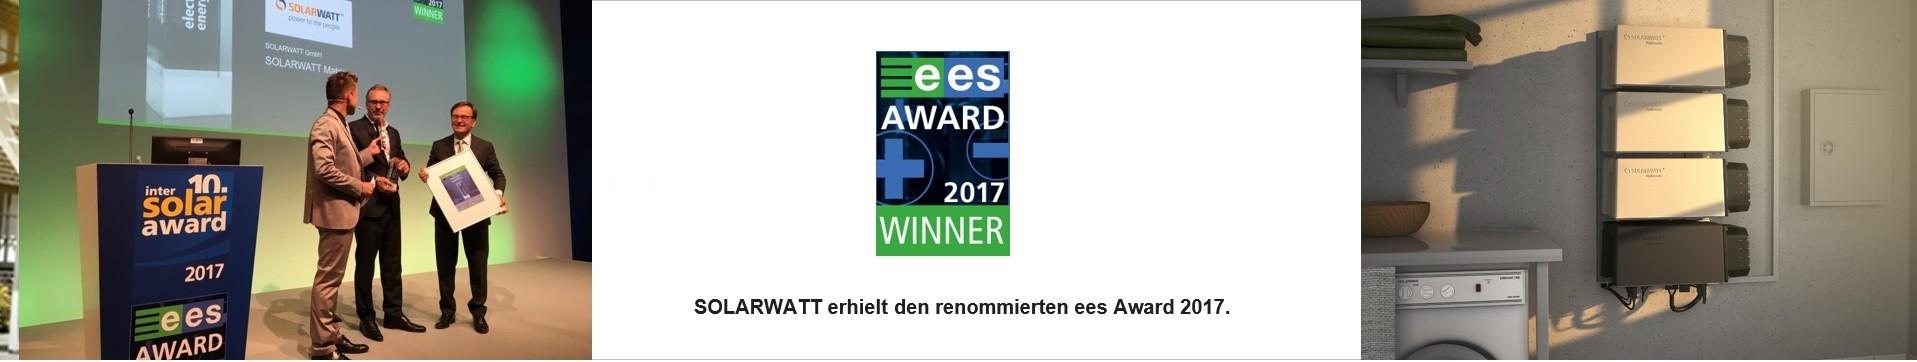 Solarwatt gewinnt ees AWARD 2017